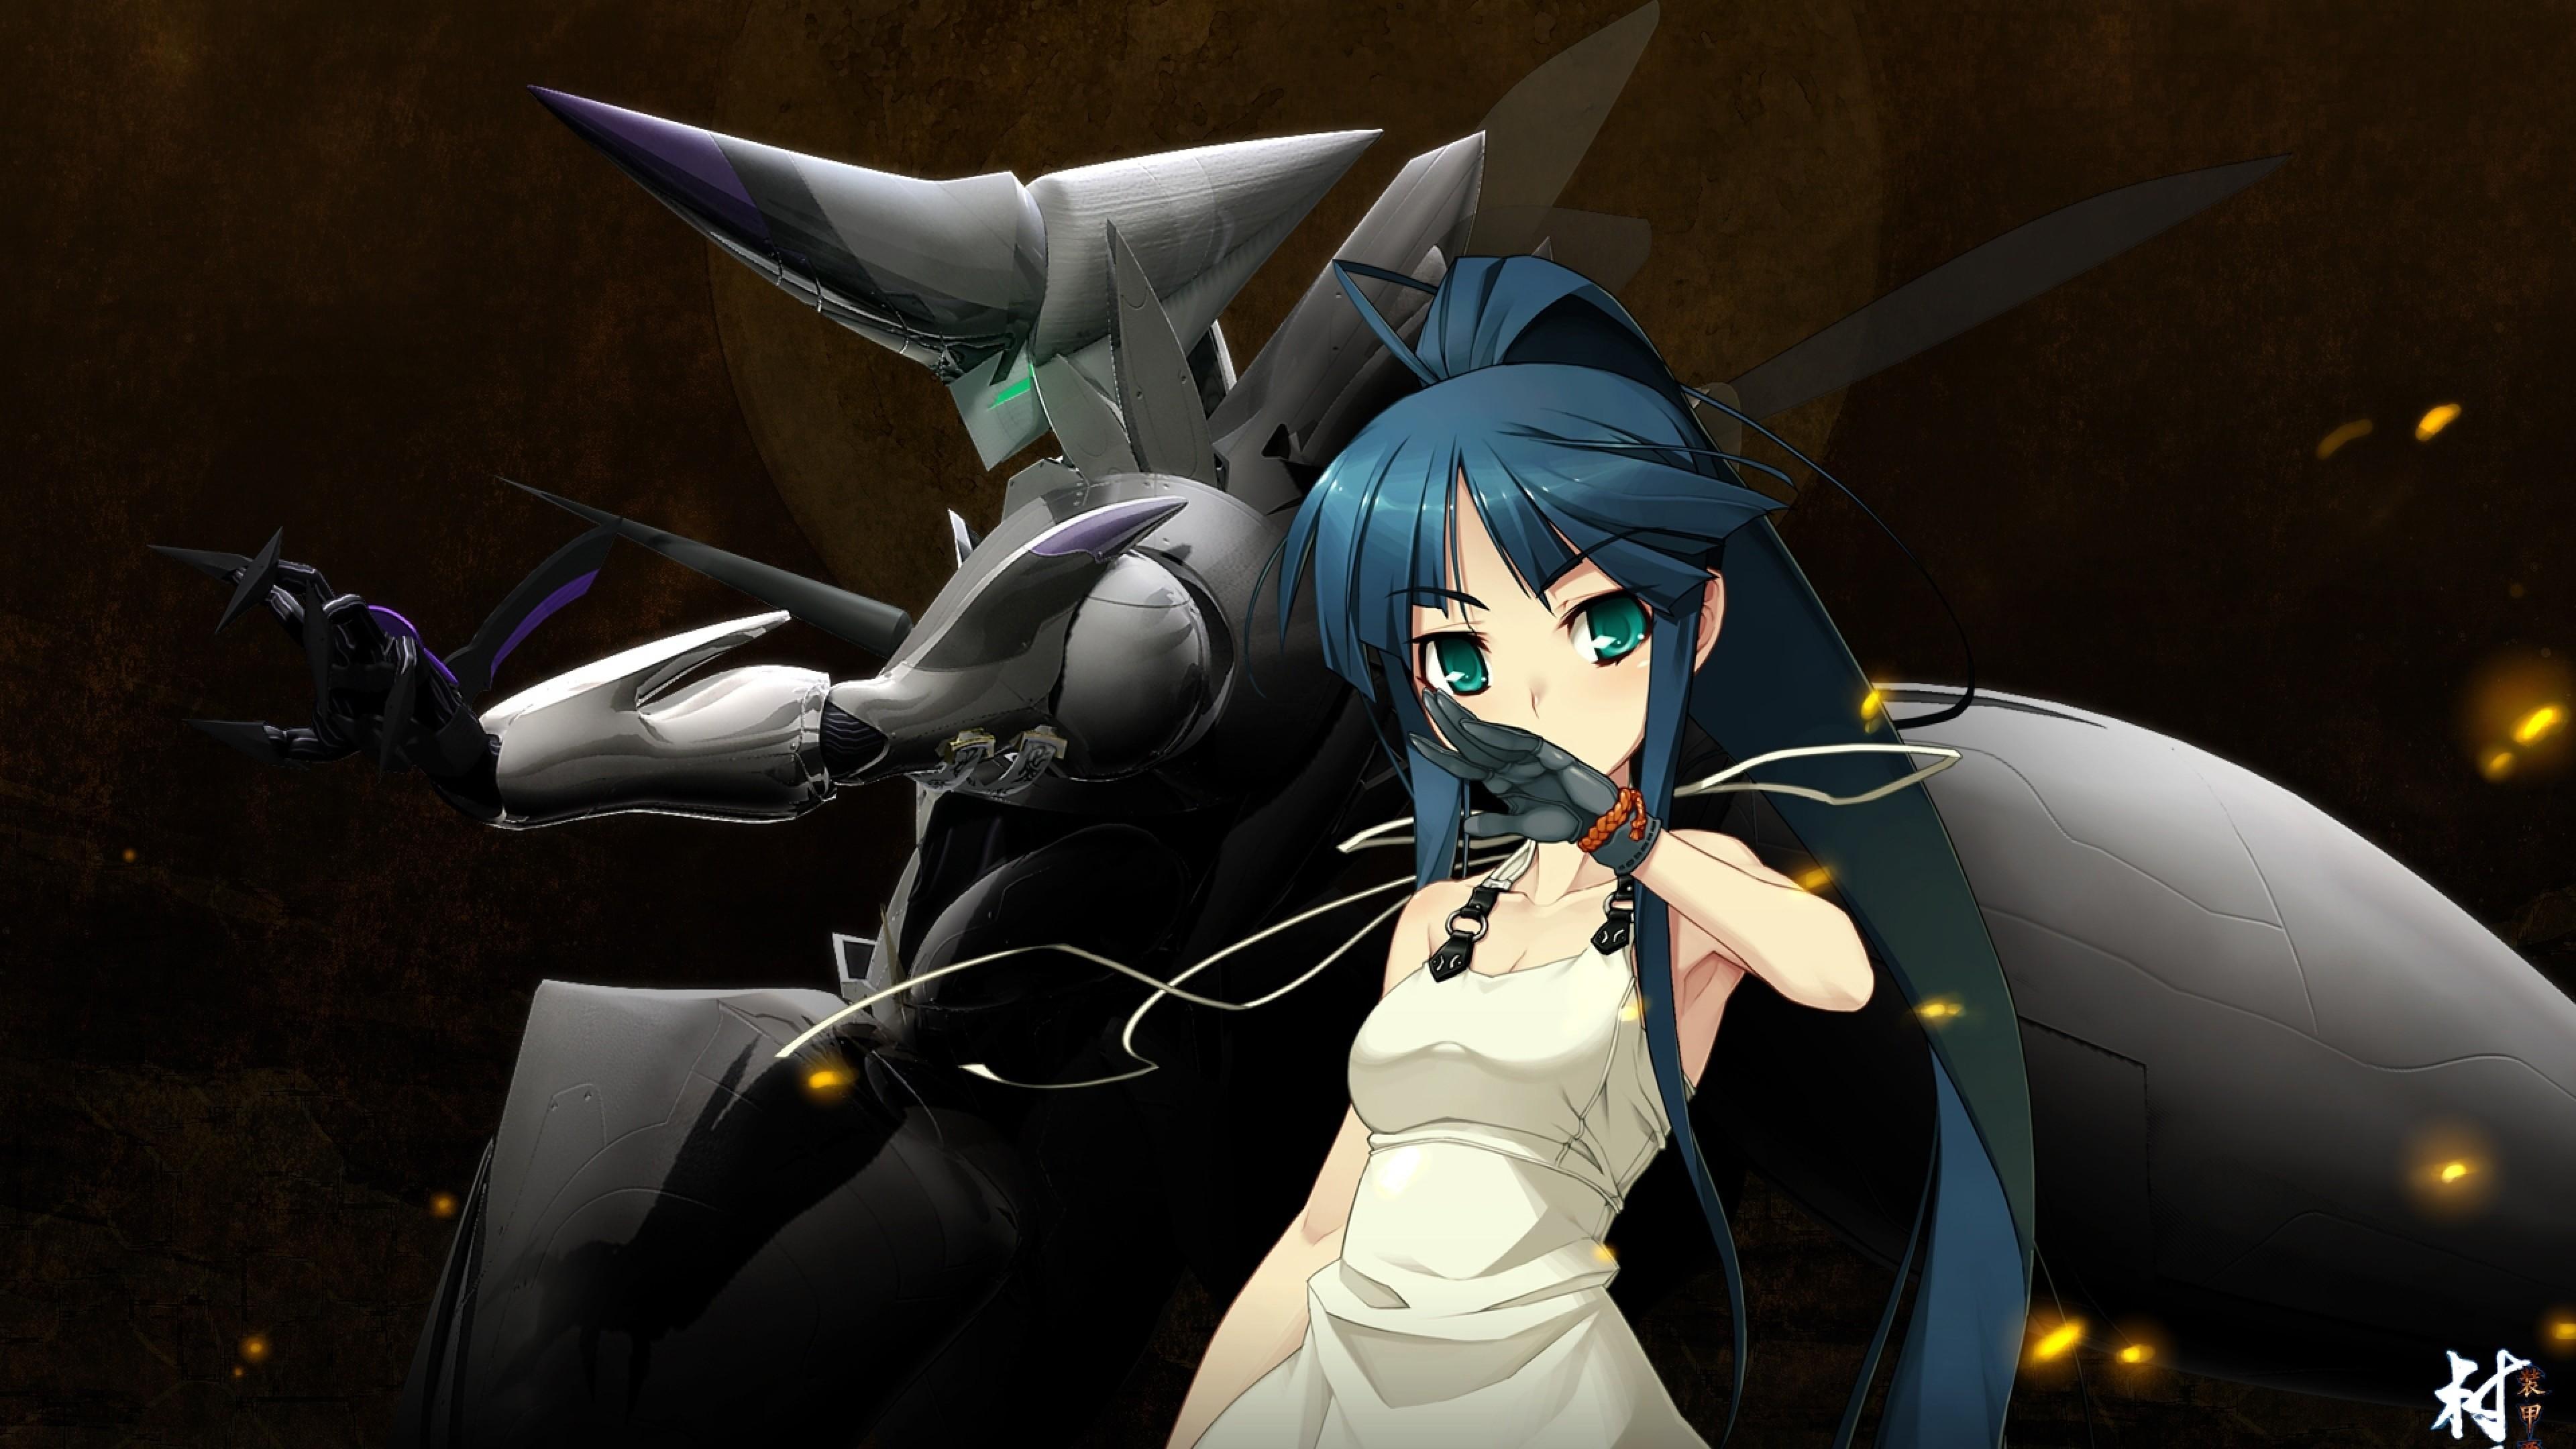 Wallpaper nitroplus, full metal daemon muramasa, minato hikaru,  girl, robot,